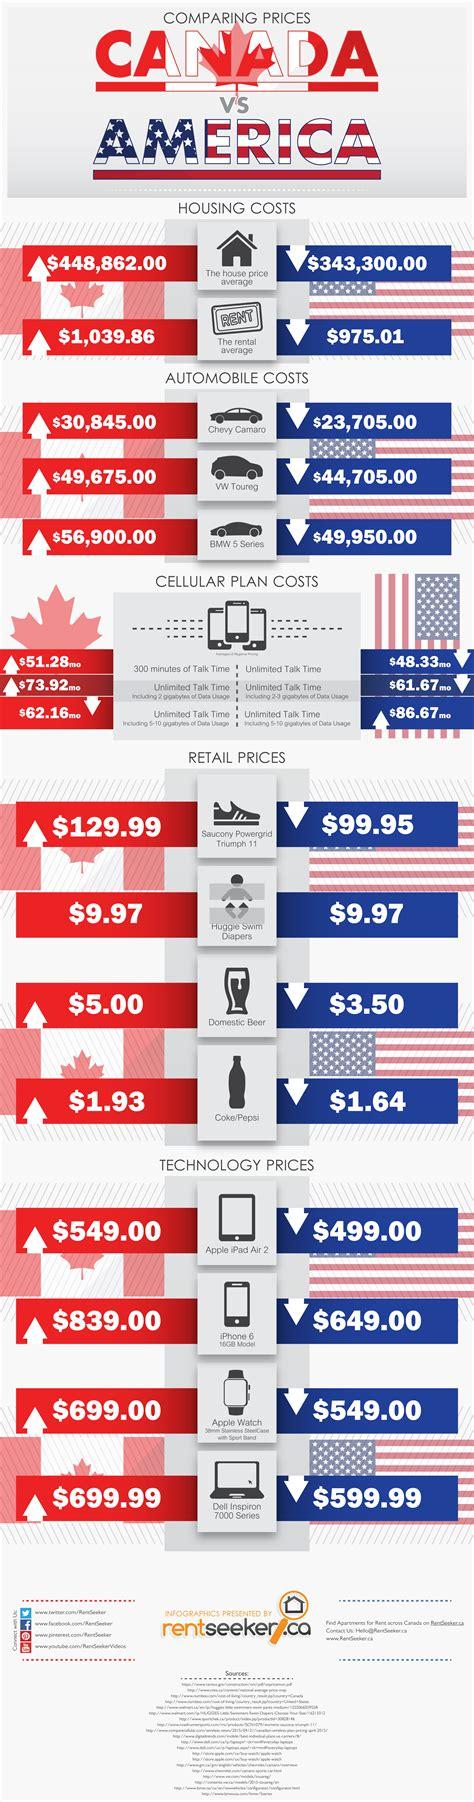 prices usa canada vs u s price comparison on housing autos more